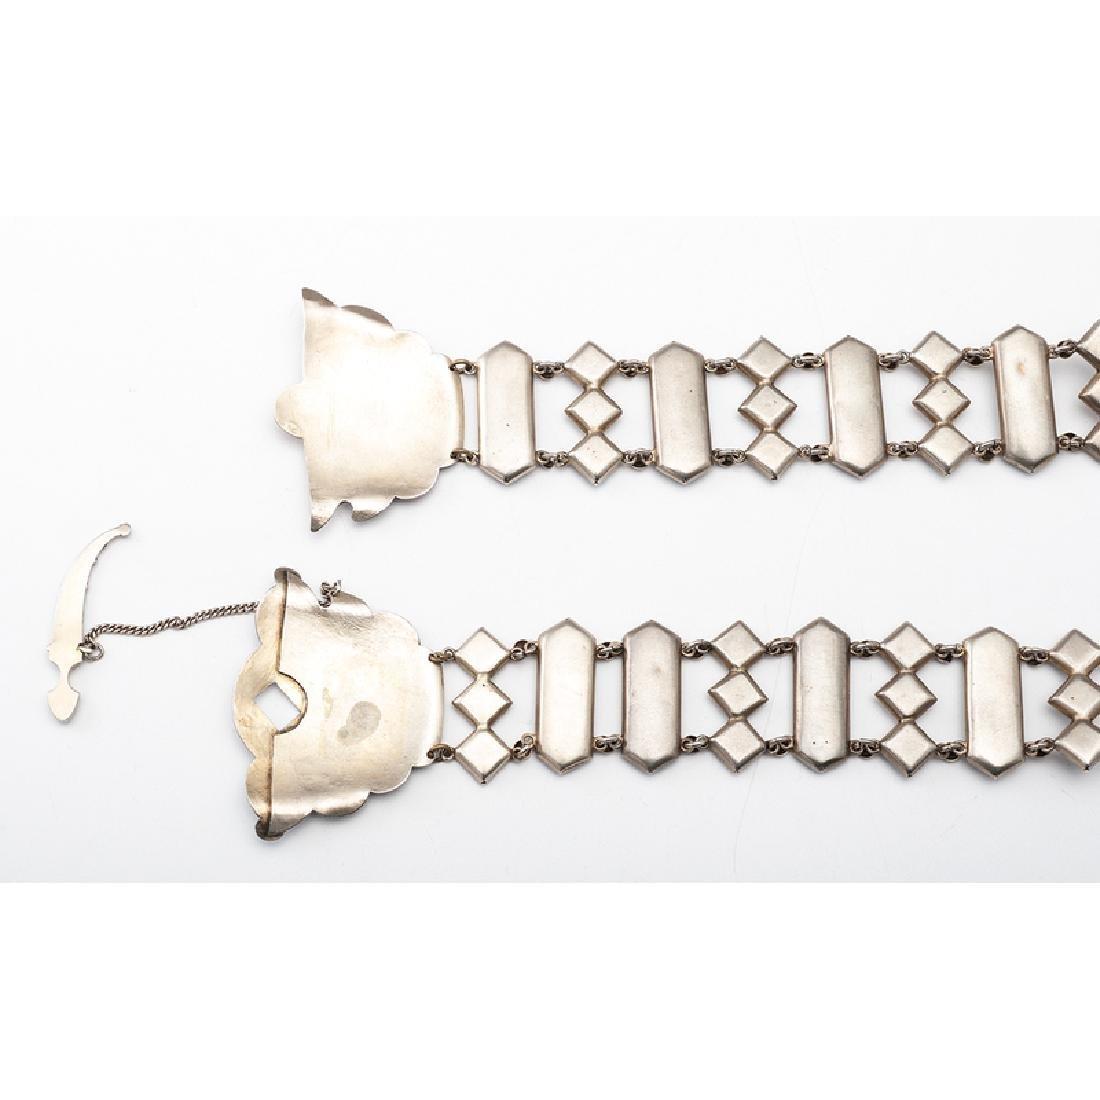 Russian Gilt Silver and Enamel Belt - 4